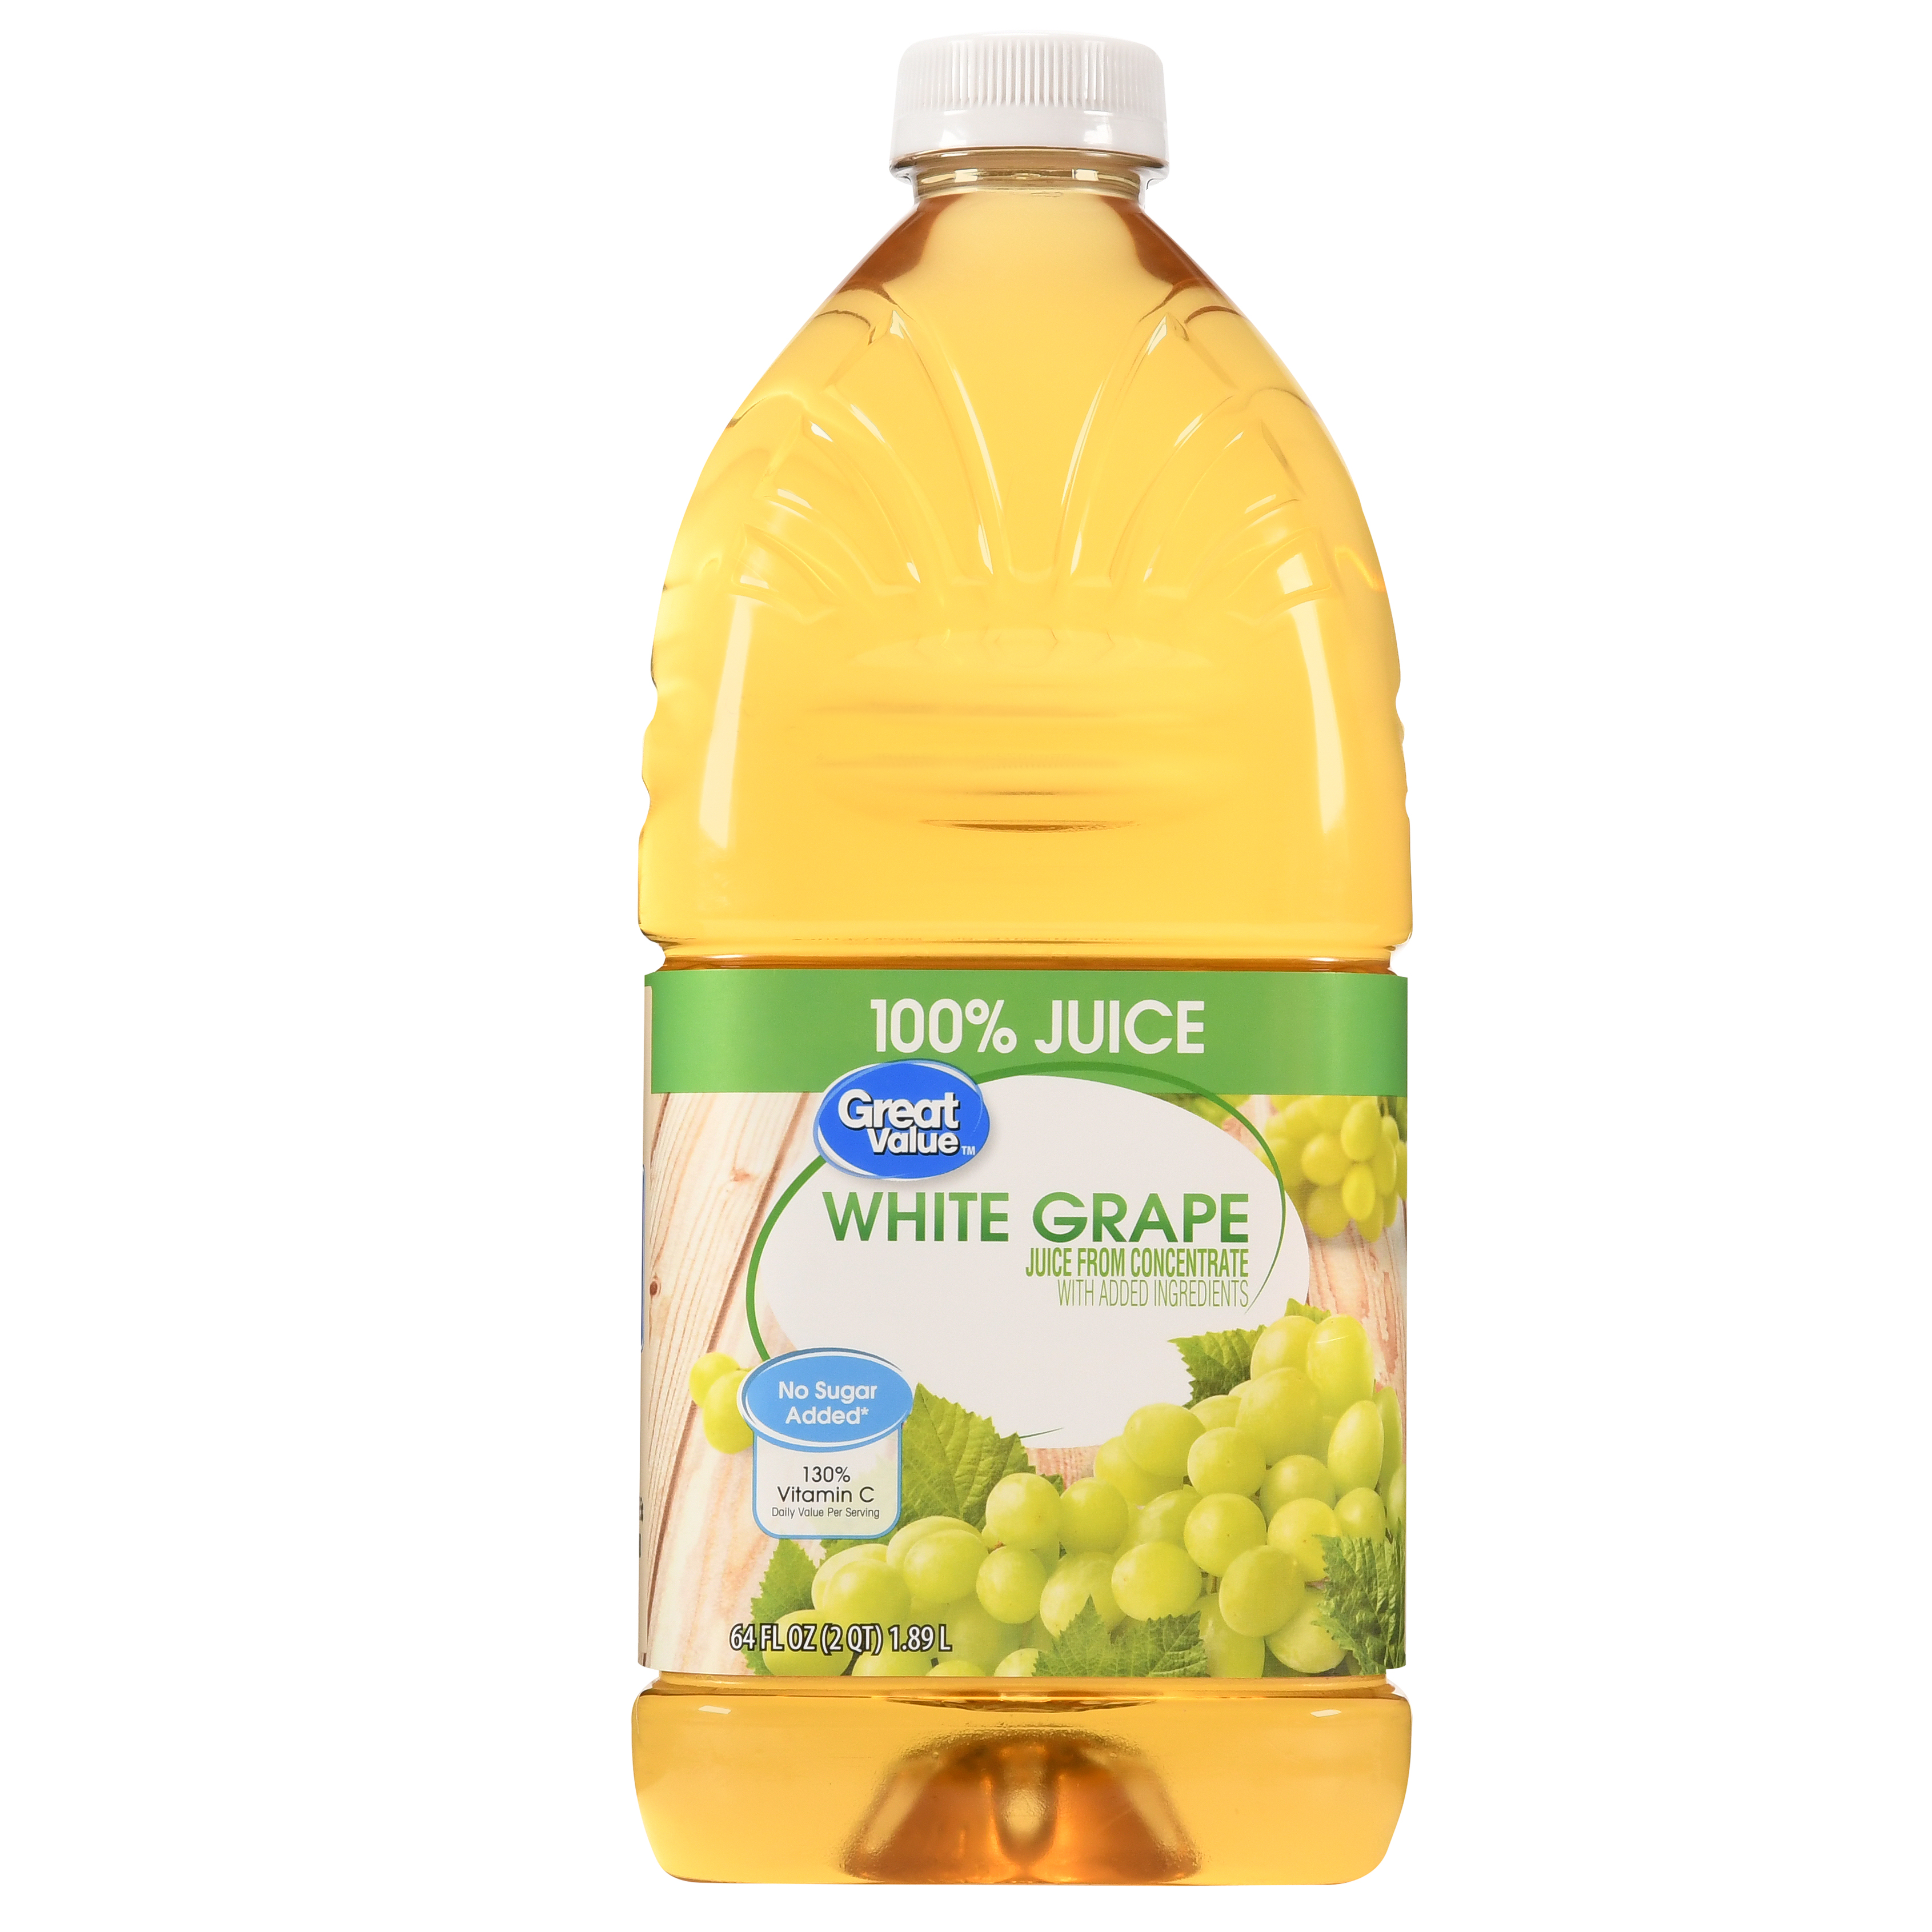 Great Value 100% Juice, White Grape, 64 Fl Oz, 1 Count